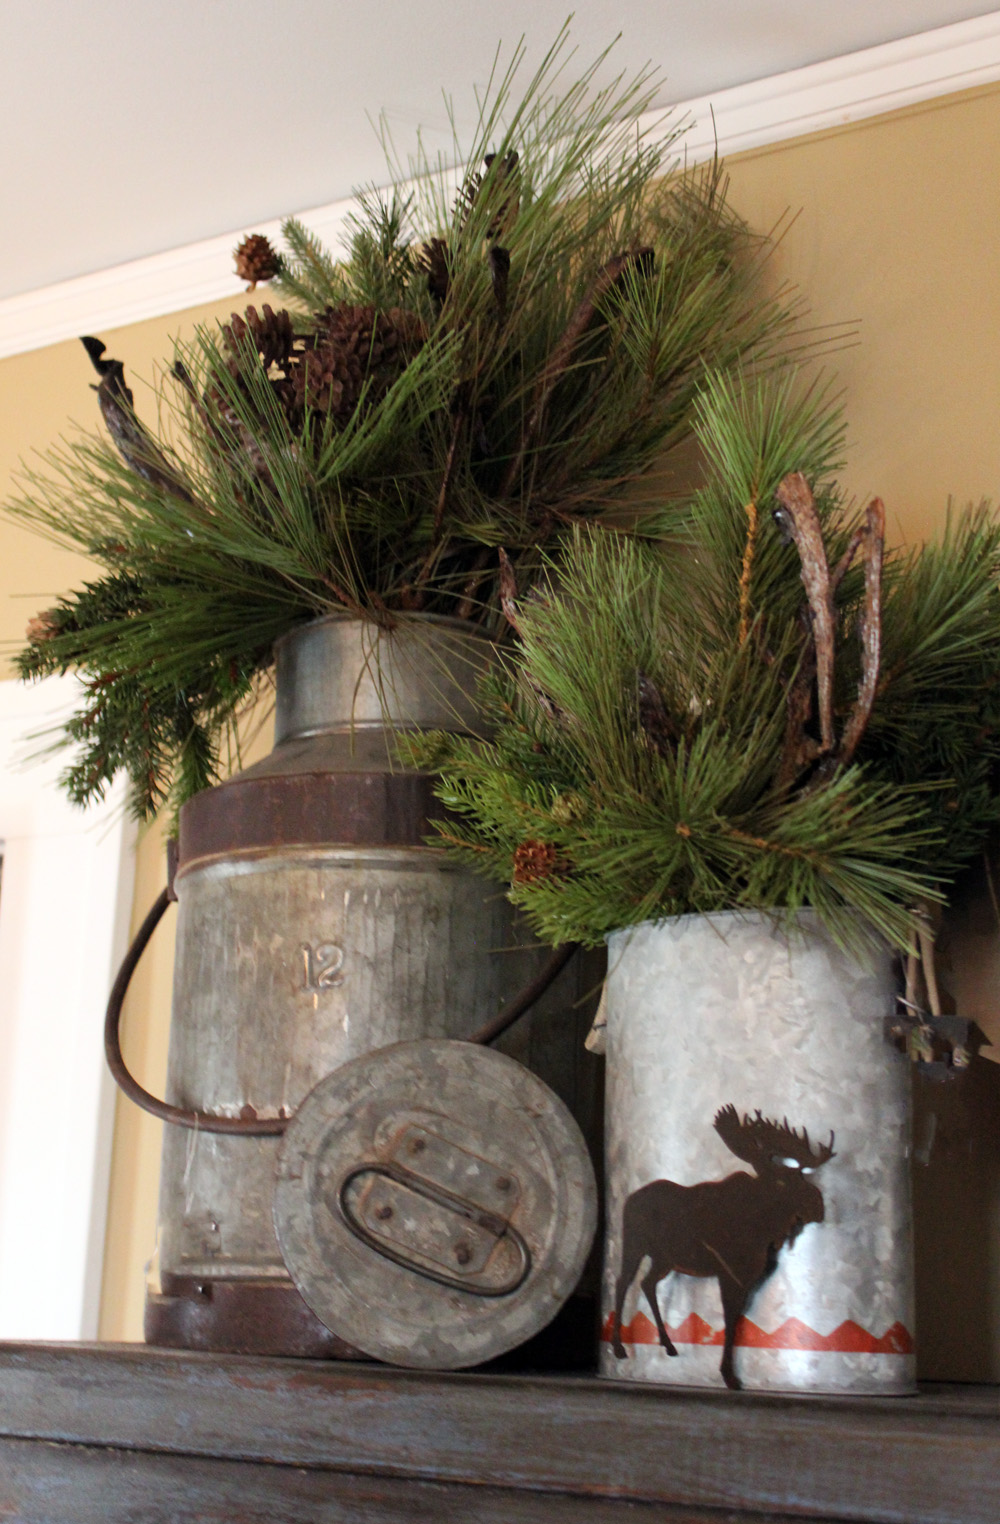 Pine Arrangement in a Milk Jug